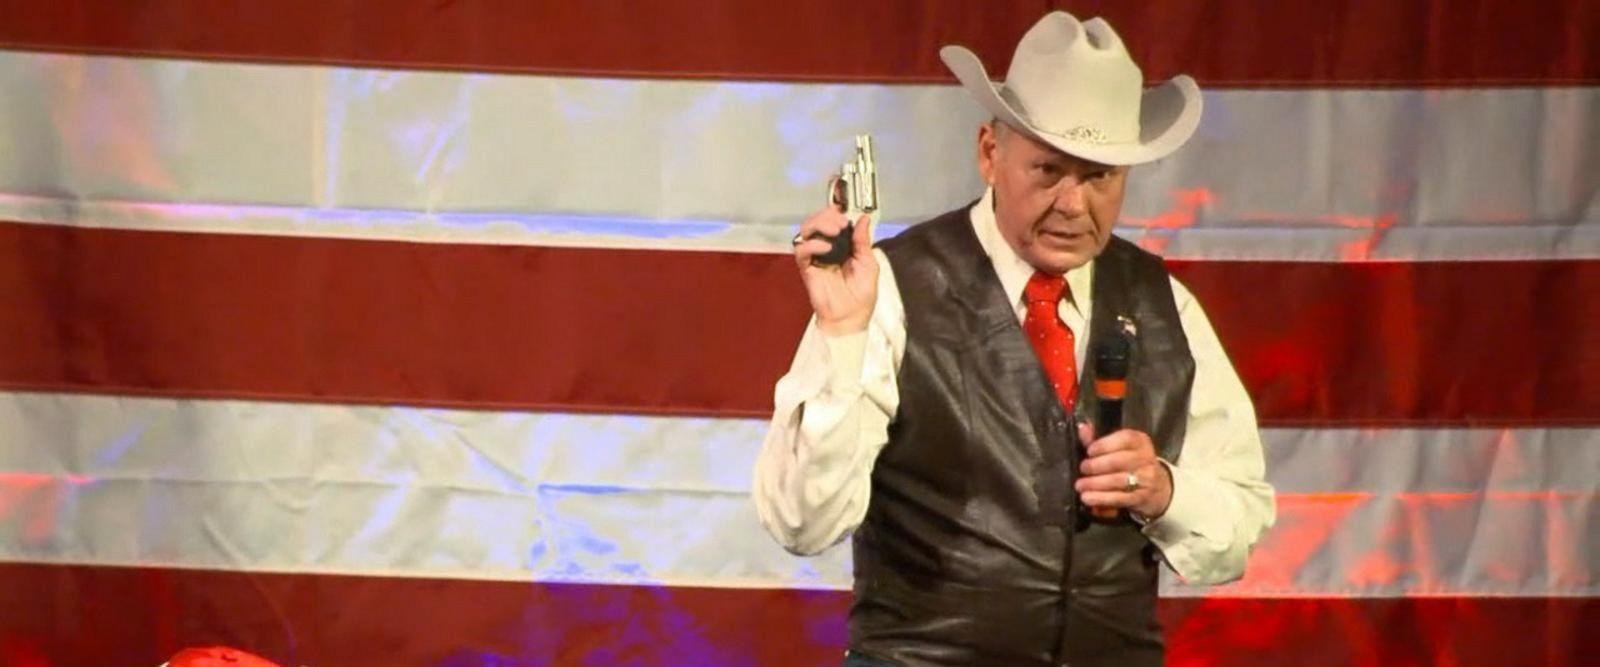 VIDEO: Bannon breaks with Trump in Alabama Senate race